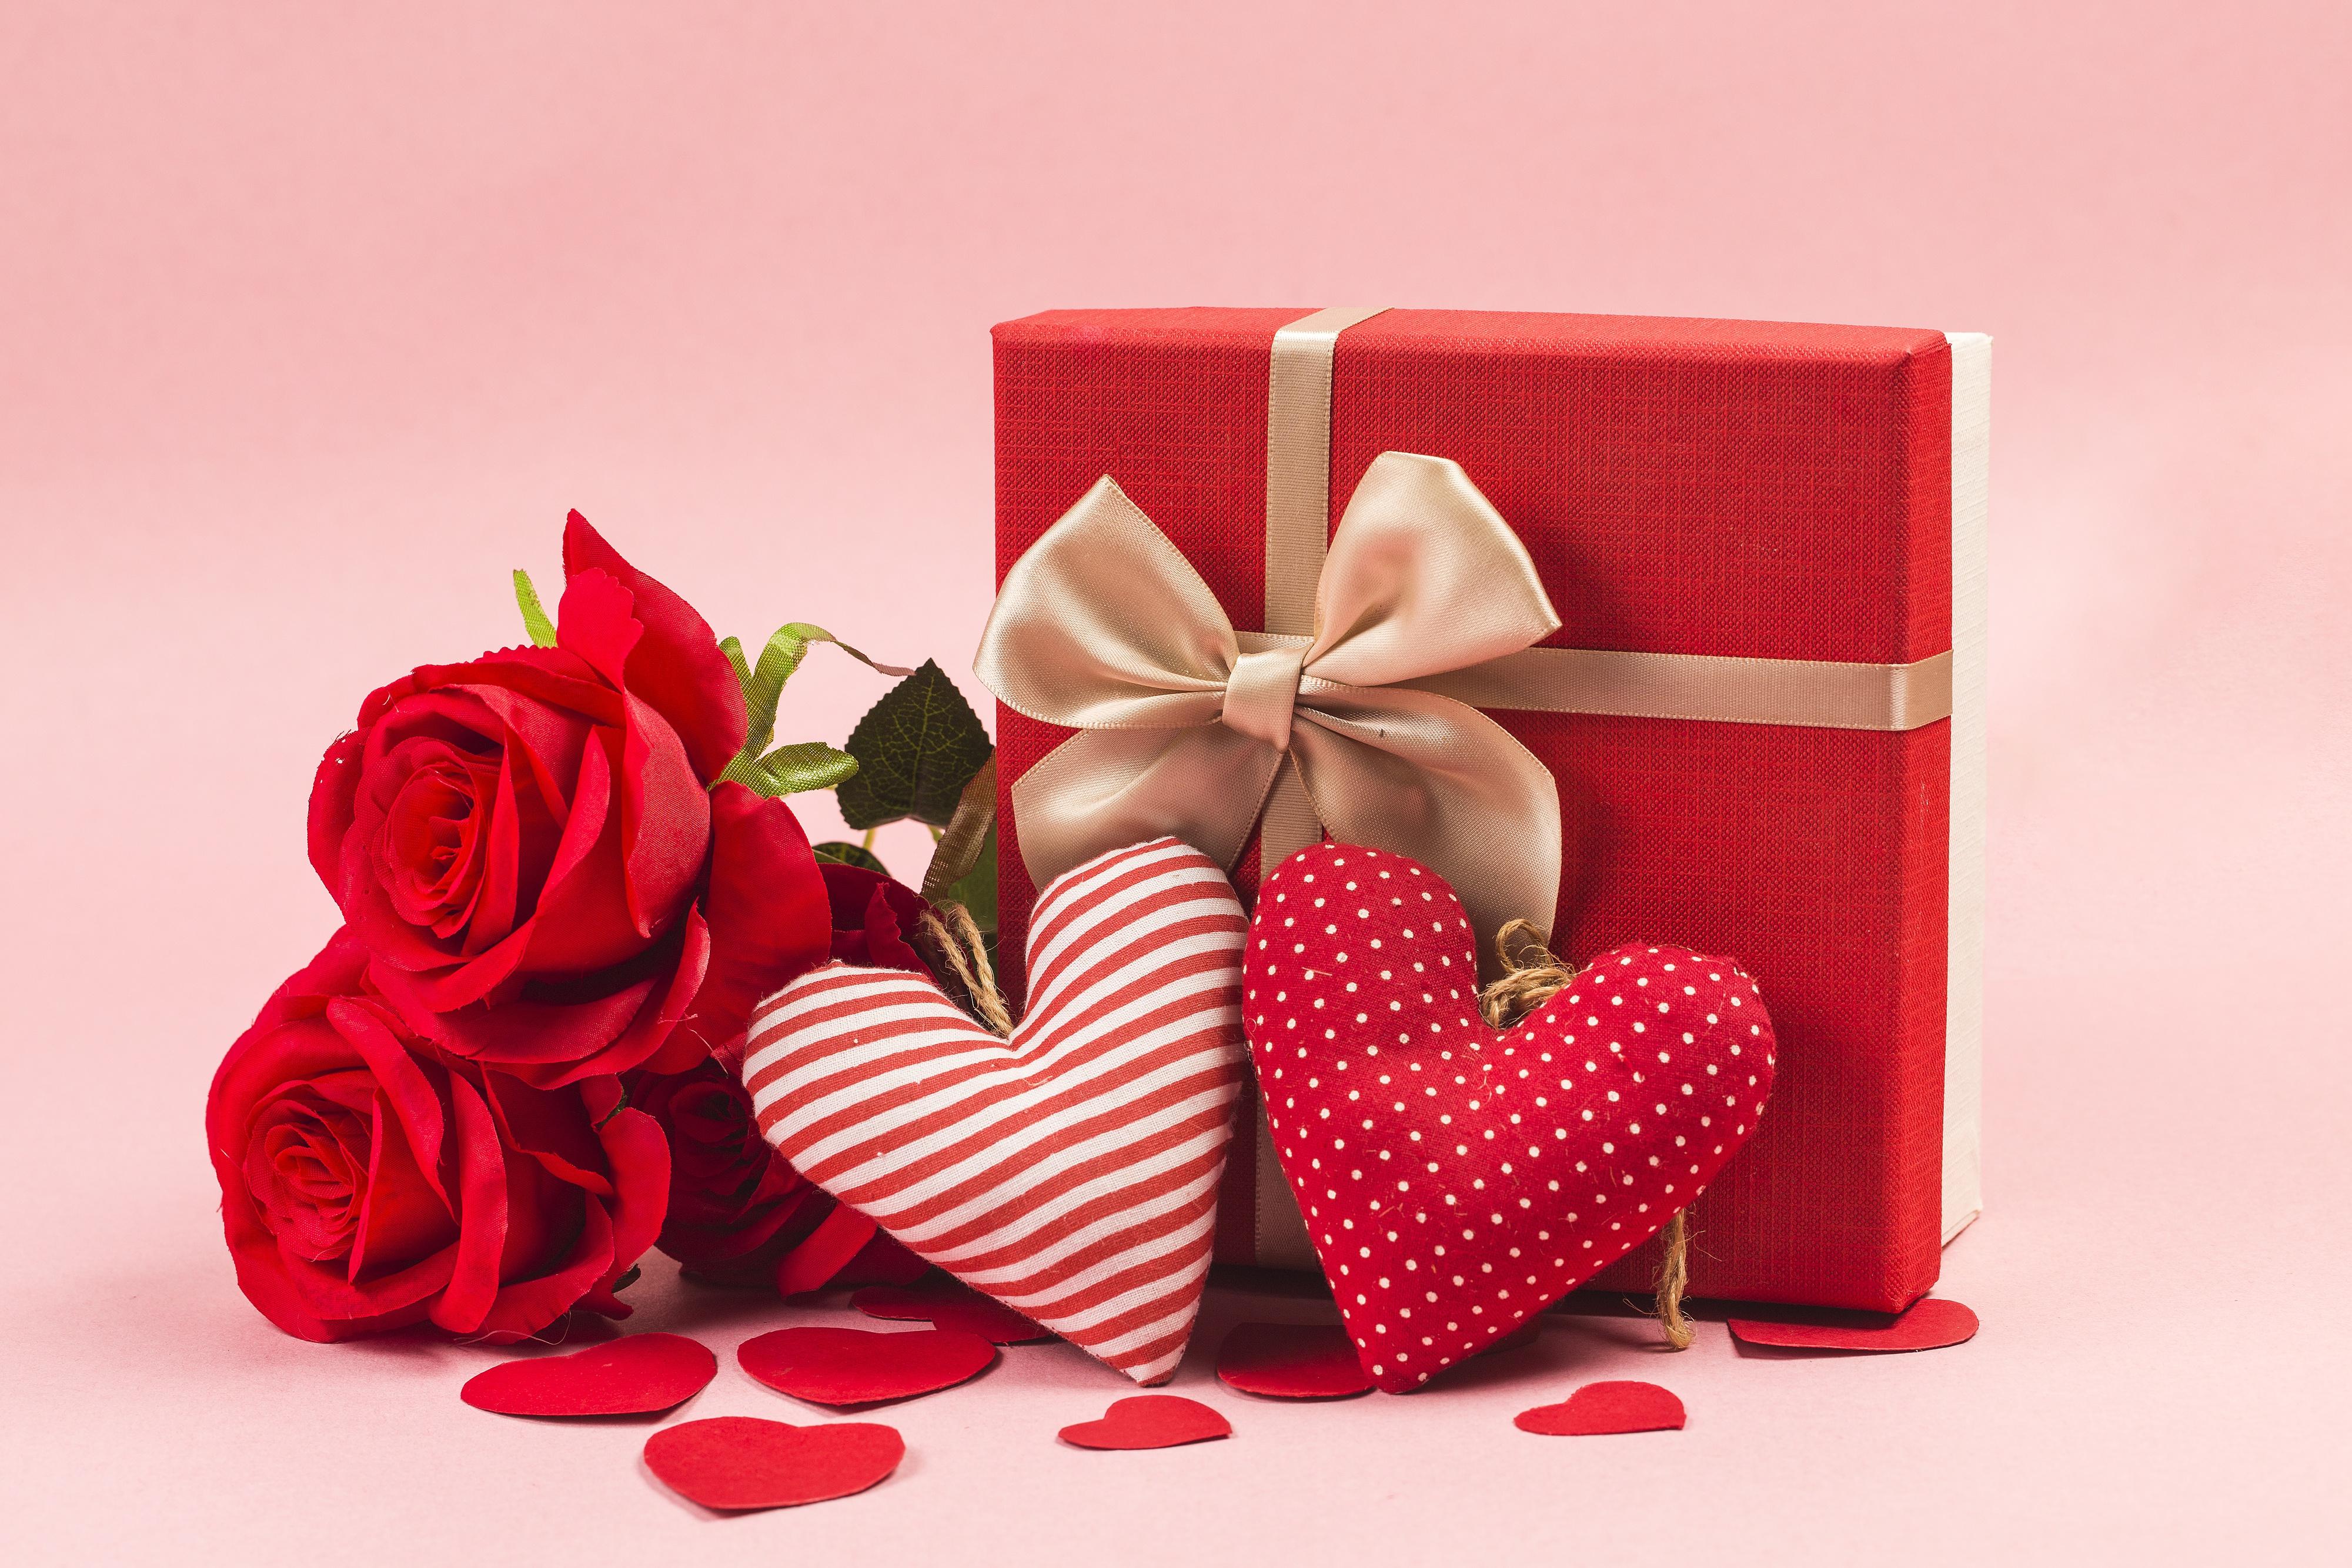 paperb valentine day gift - HD2880×1800